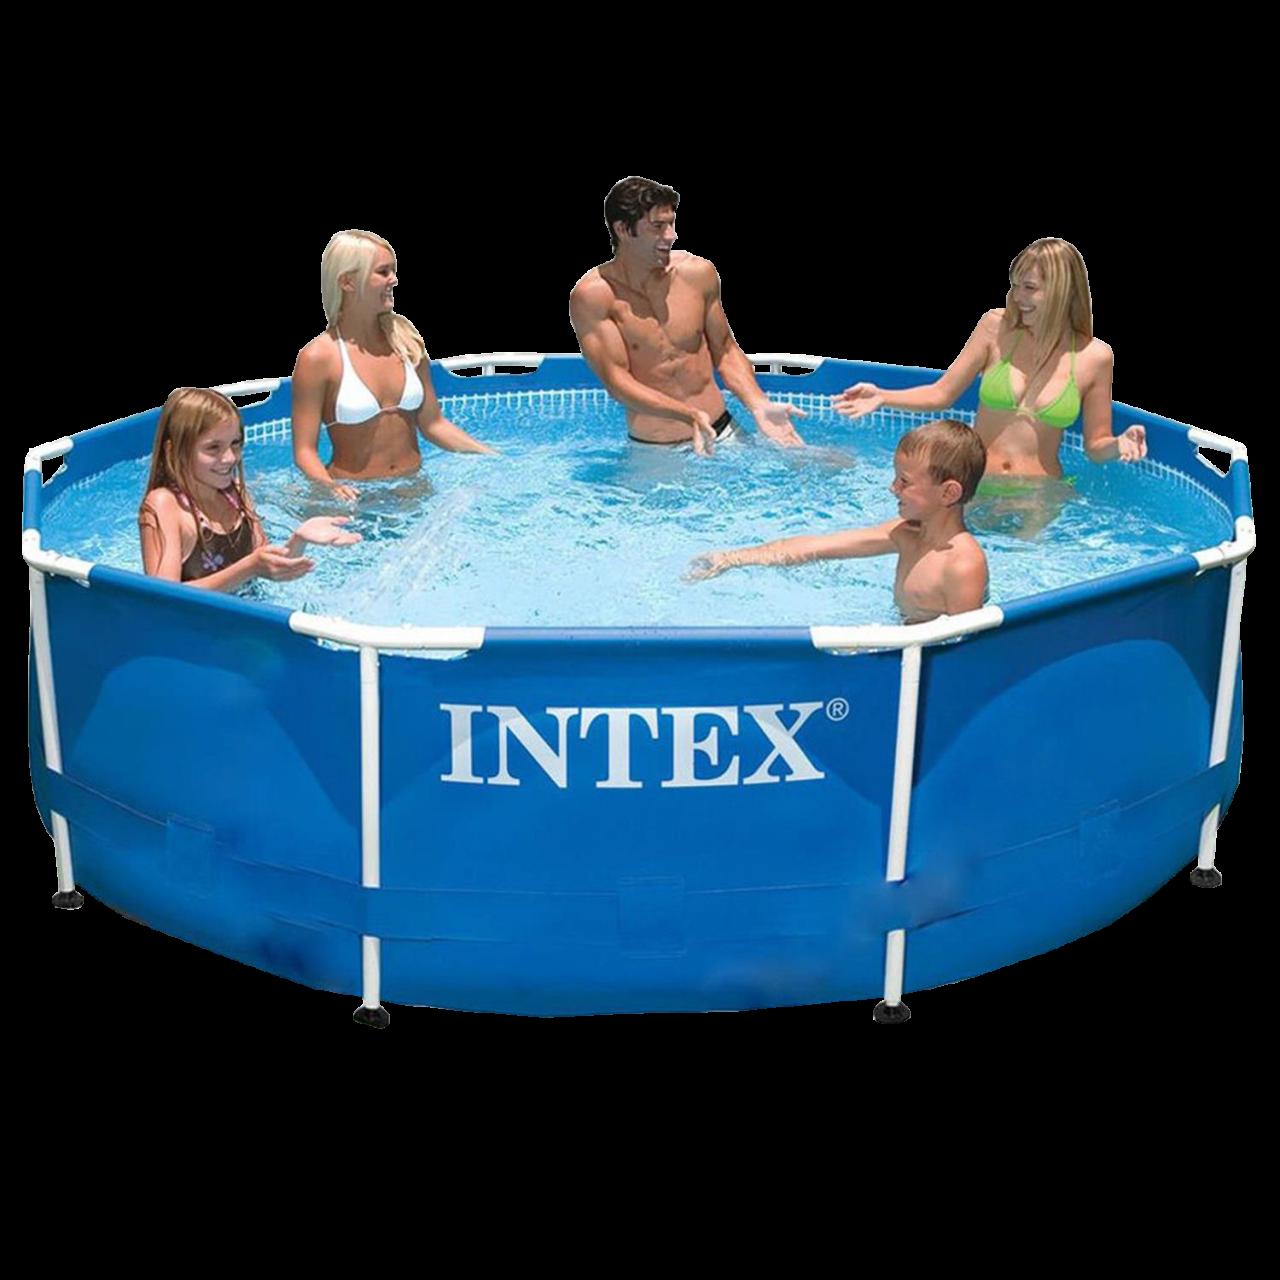 Intex Frame Pool 305x76cm Stahlrohrbecken Schwimmbecken Swimming Pool 28200